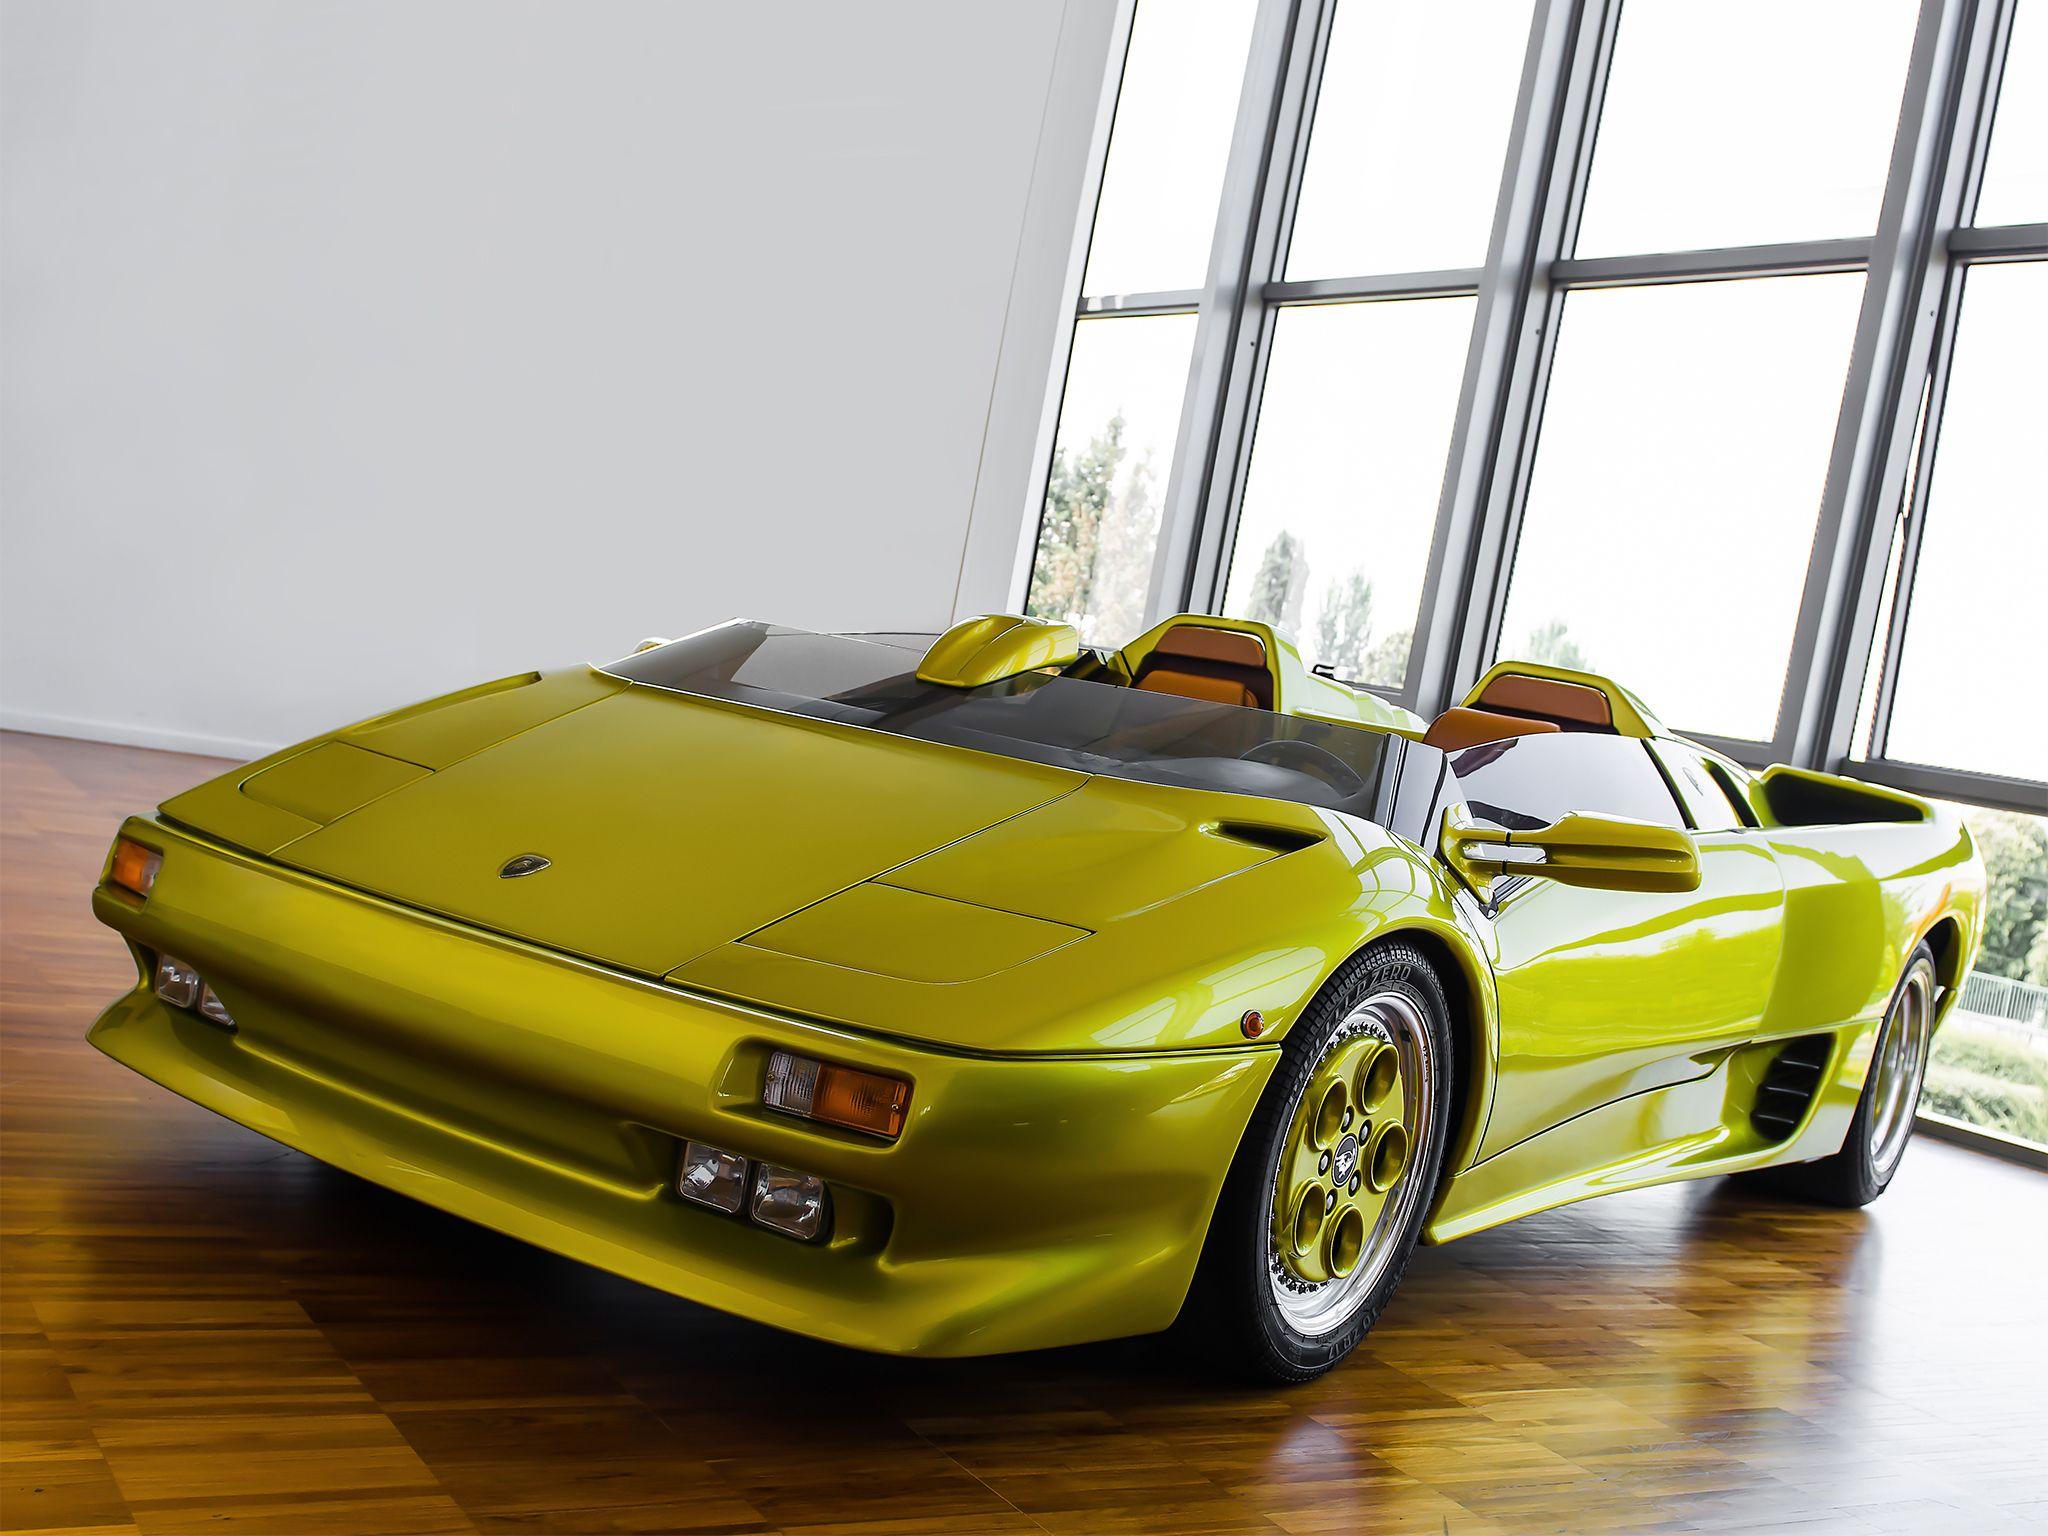 1992 Lamborghini Diablo Roadster Prototype Autos From The Future